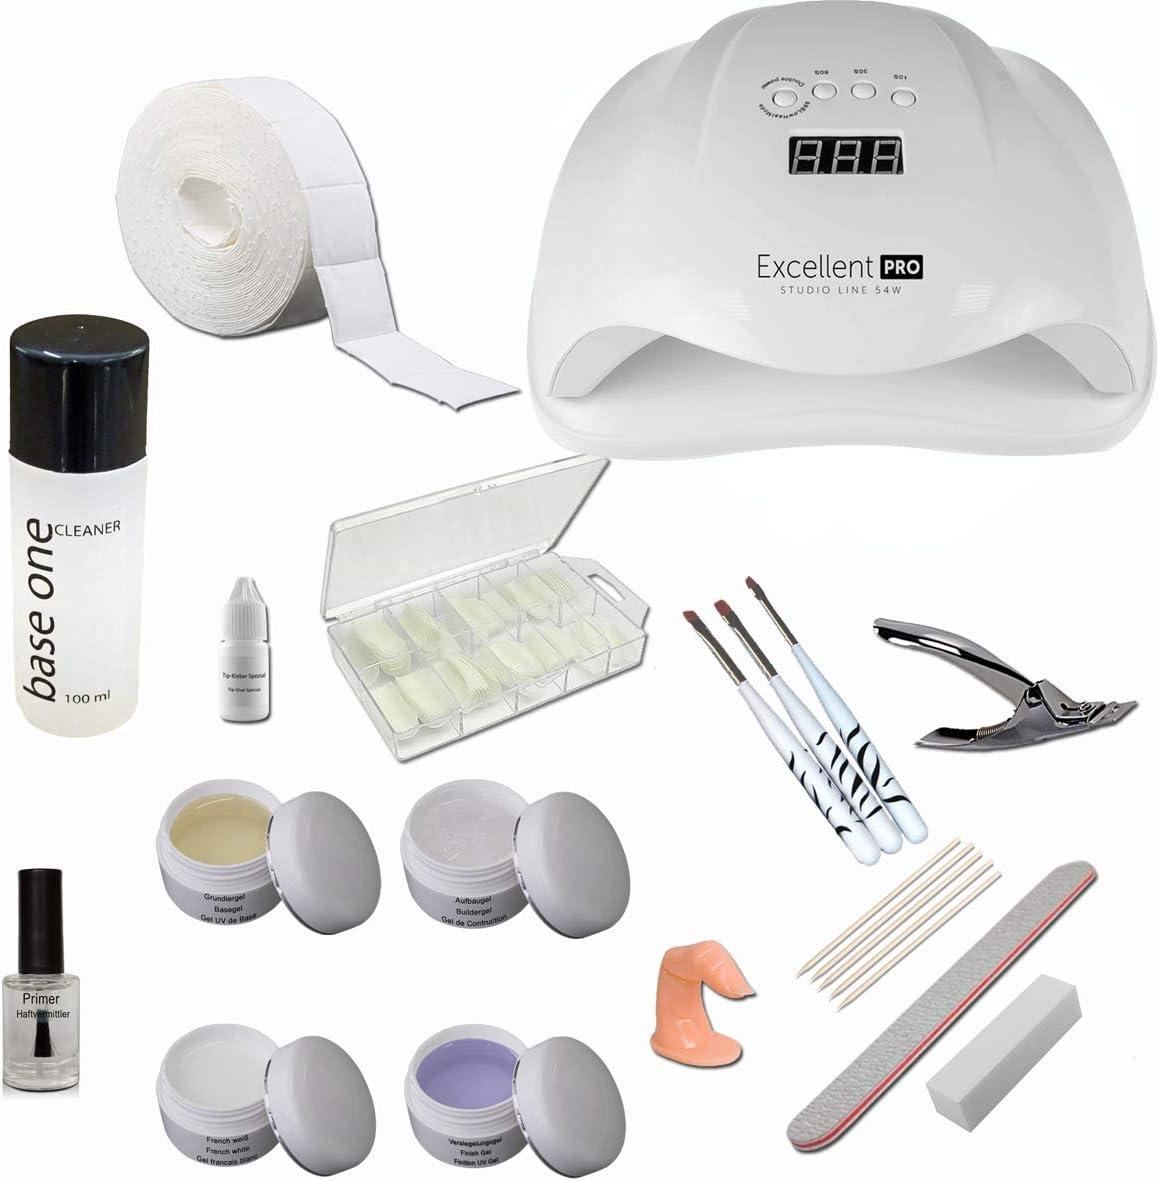 Kit Starter Set para centros de Belleza - Kit de manicura – Kit de introducción para centros de Belleza